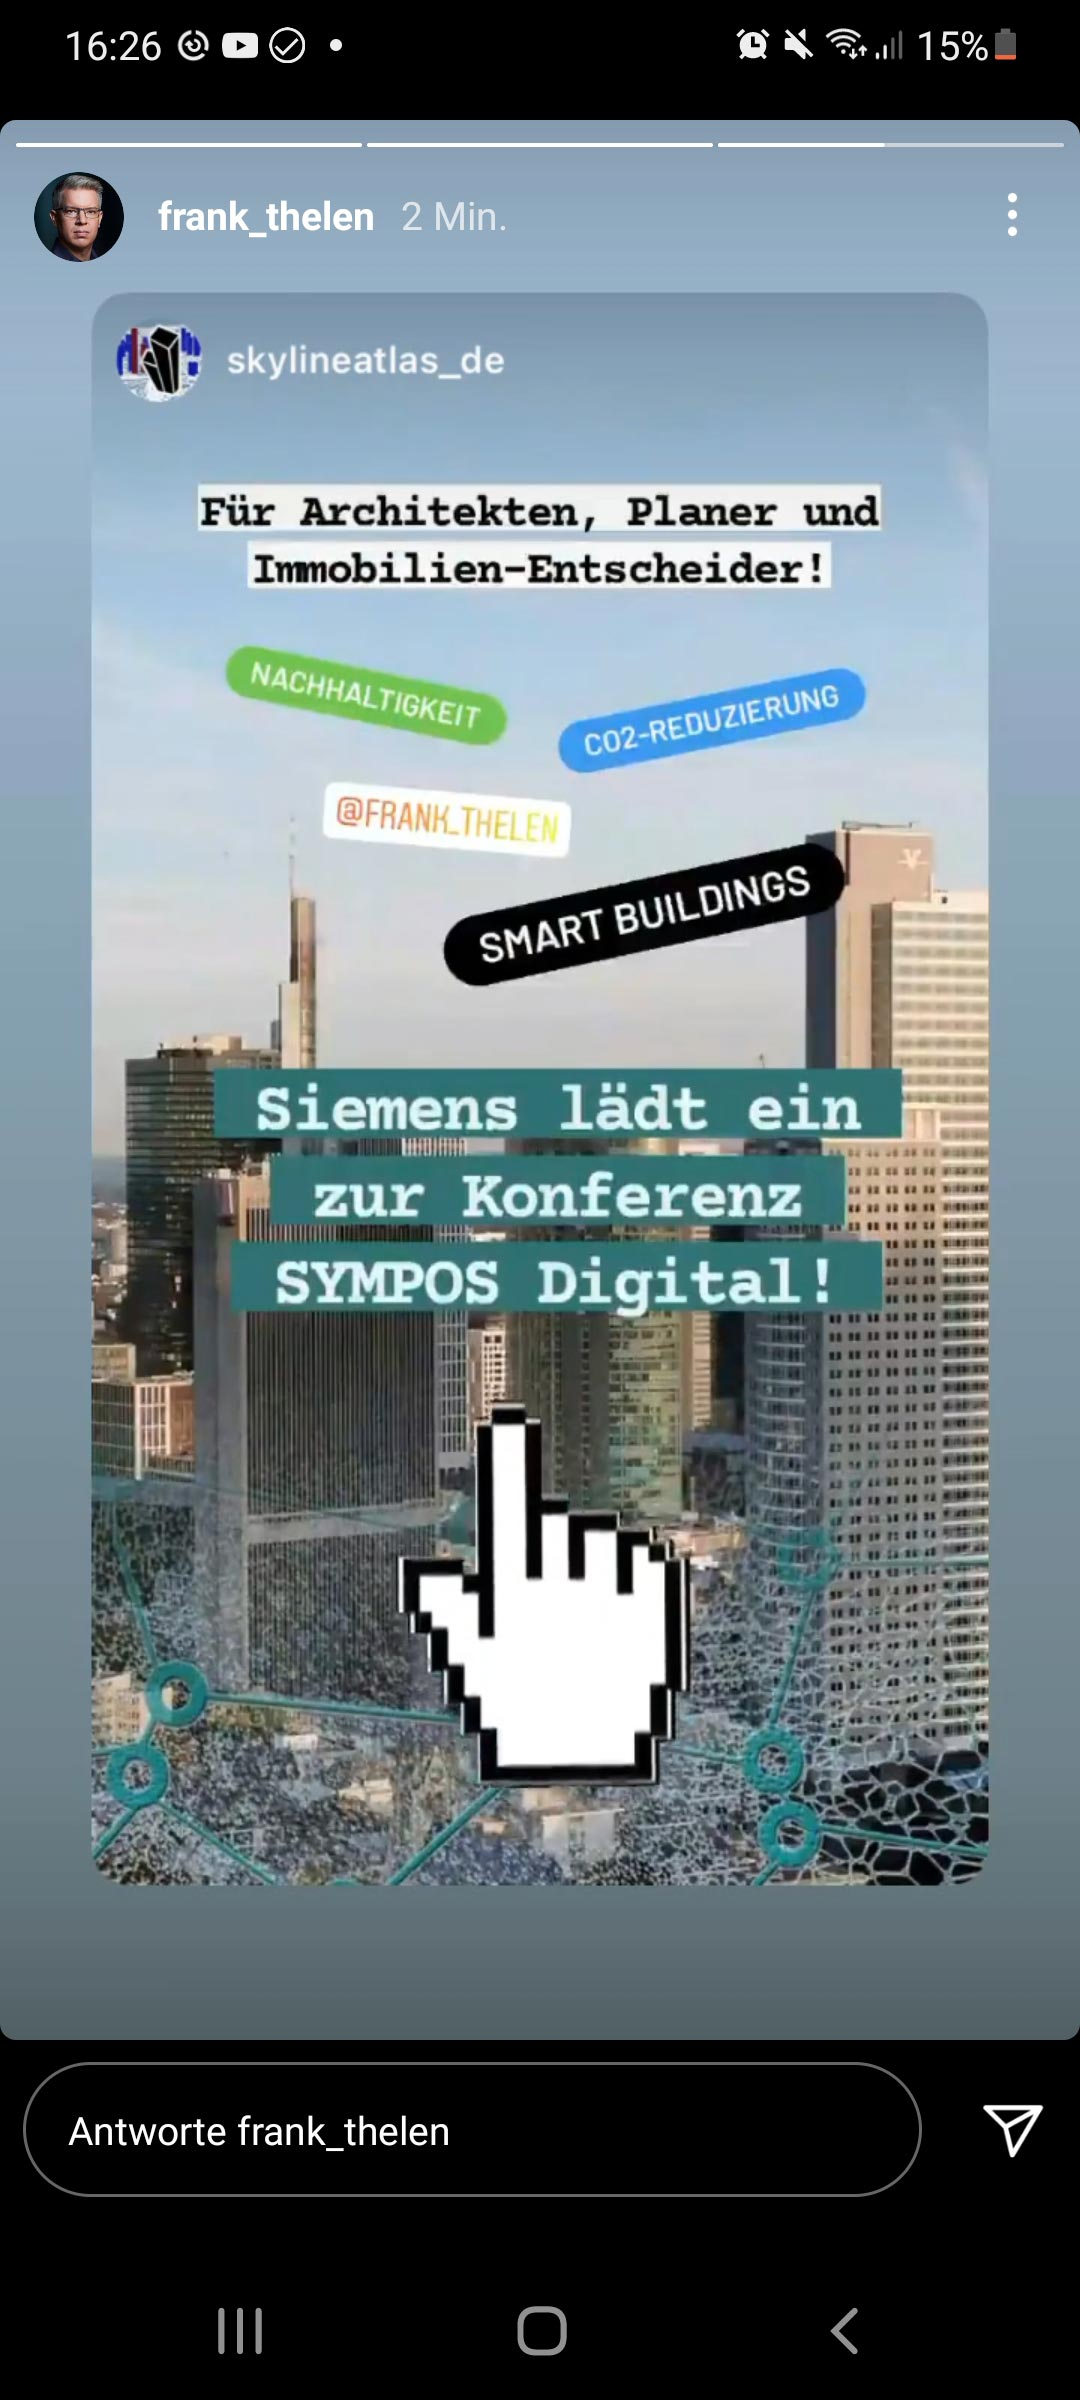 Sympos Digital 2021 - Siemens Infrastructure - Siemens Social Media Post - Frank Thelen Instagram - SKYLINE ATLAS Instagram - Smart Buildings Veranstaltung